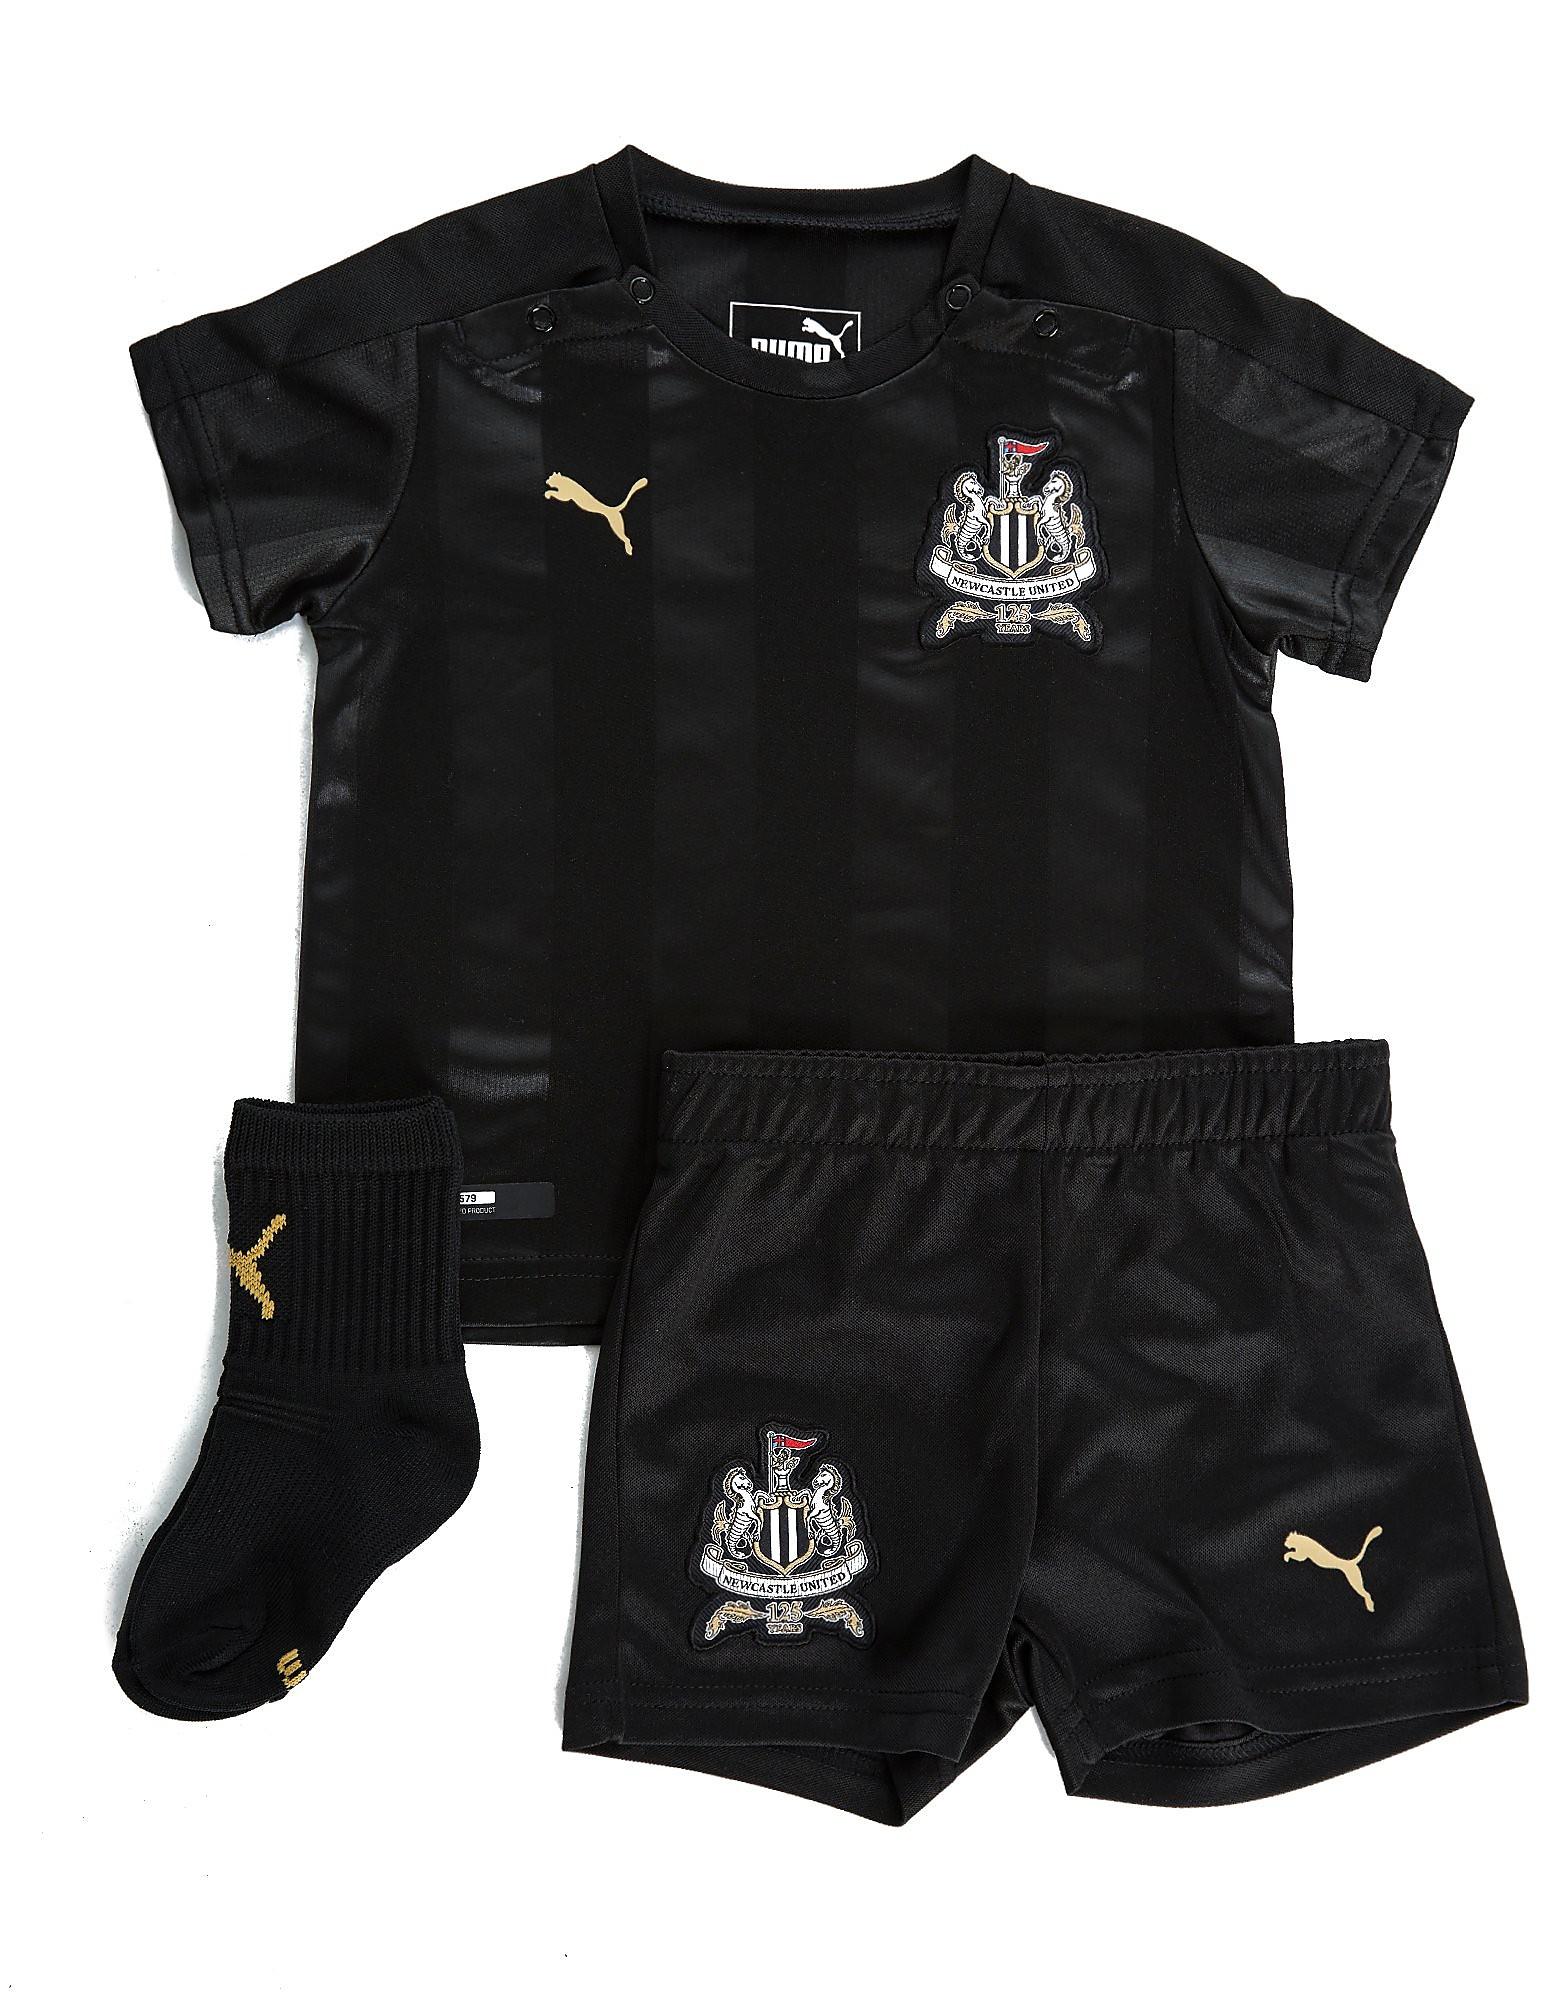 PUMA Newcastle United 2017/18 Third Kit Infant